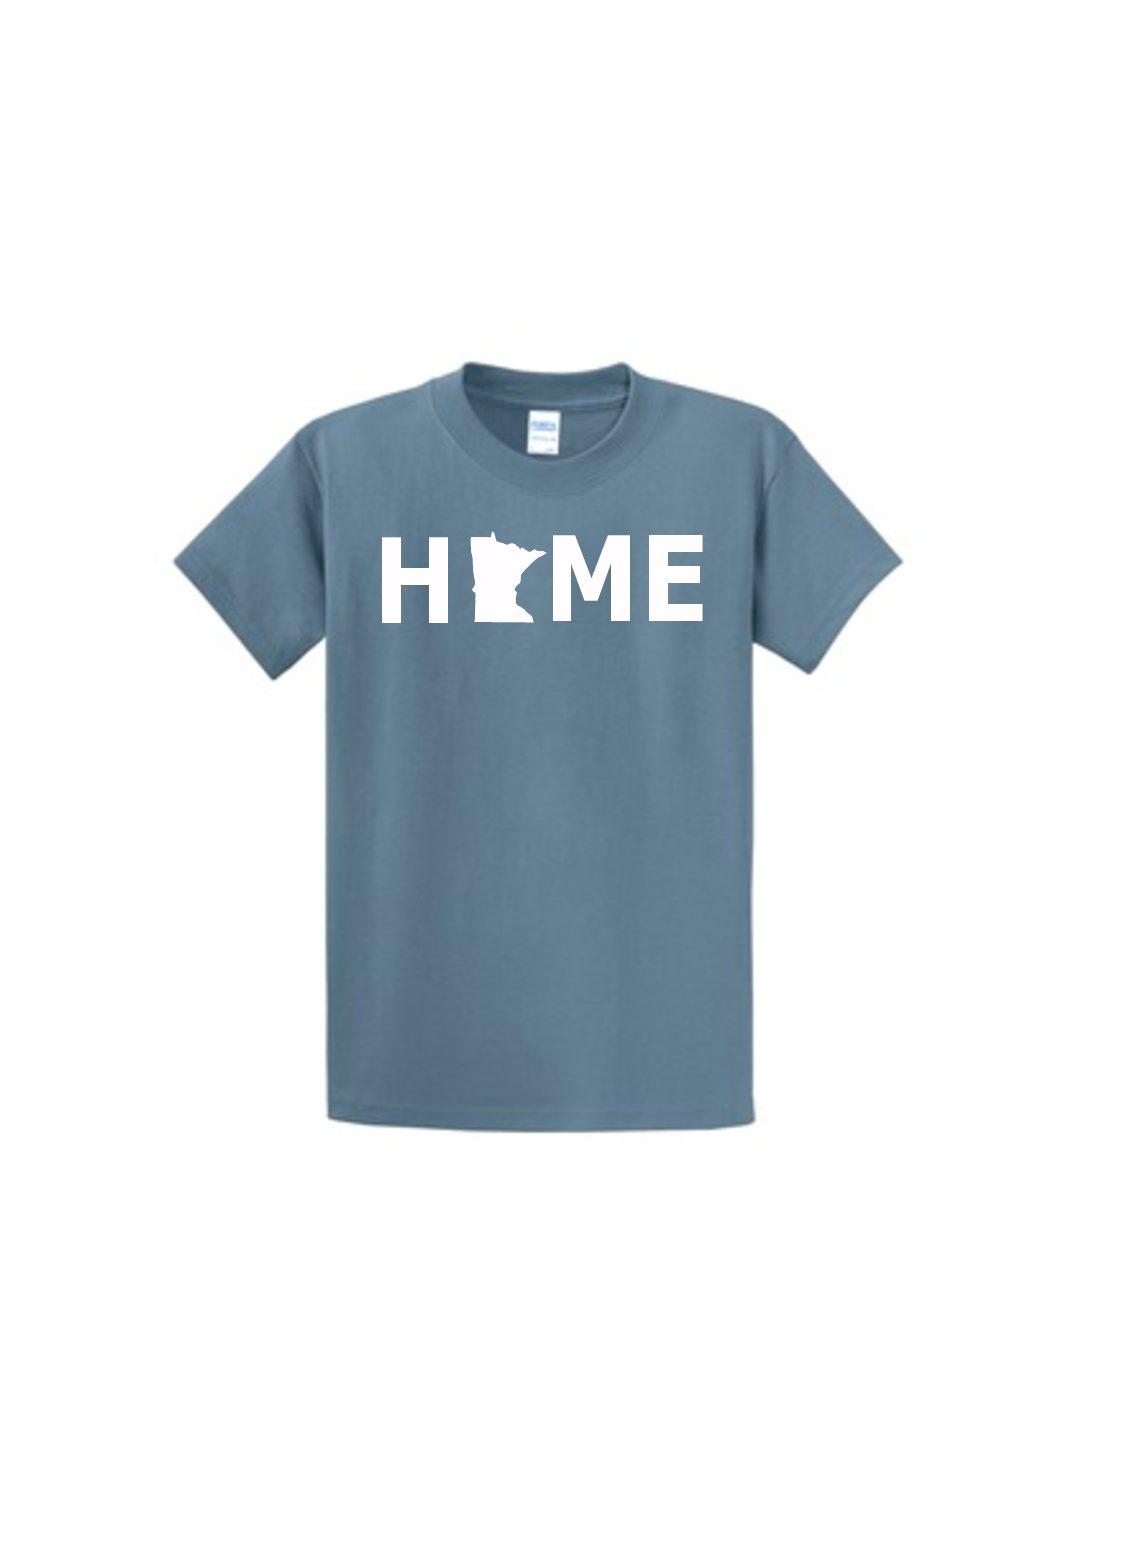 Minnesota Home Minnesota T Shirts Sweatshirts With All Original